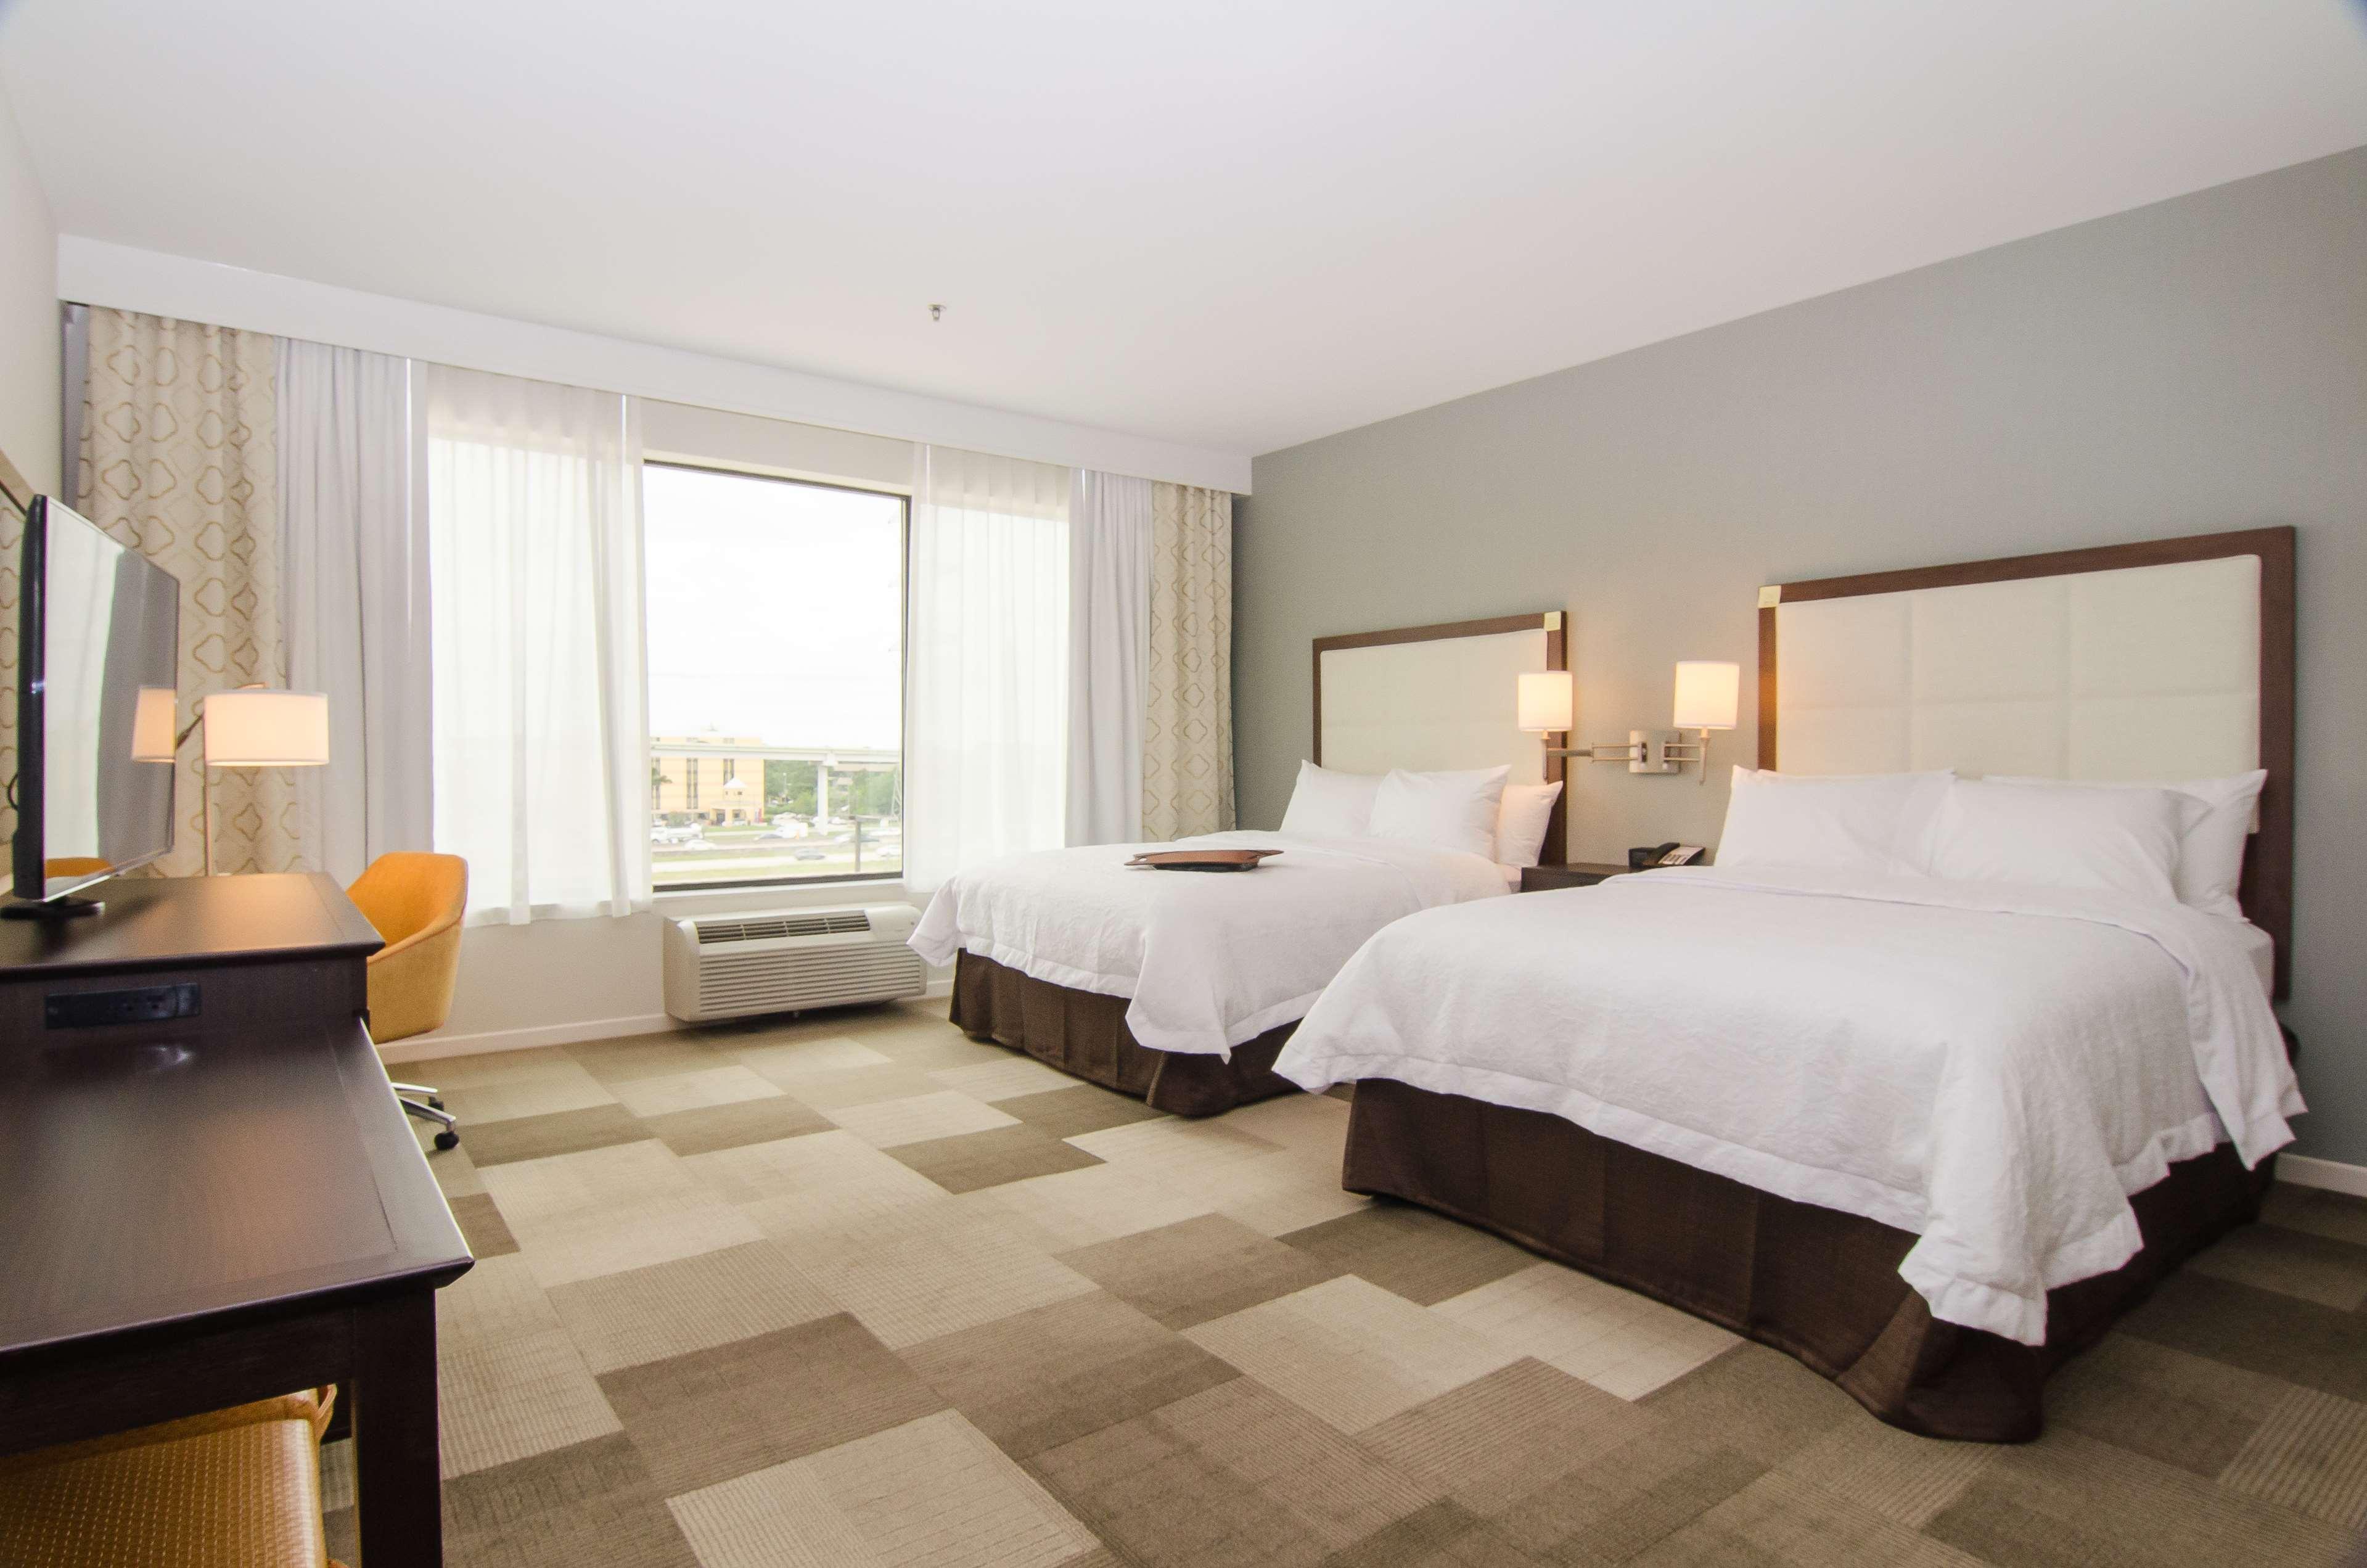 Hampton Inn & Suites Houston North IAH image 16